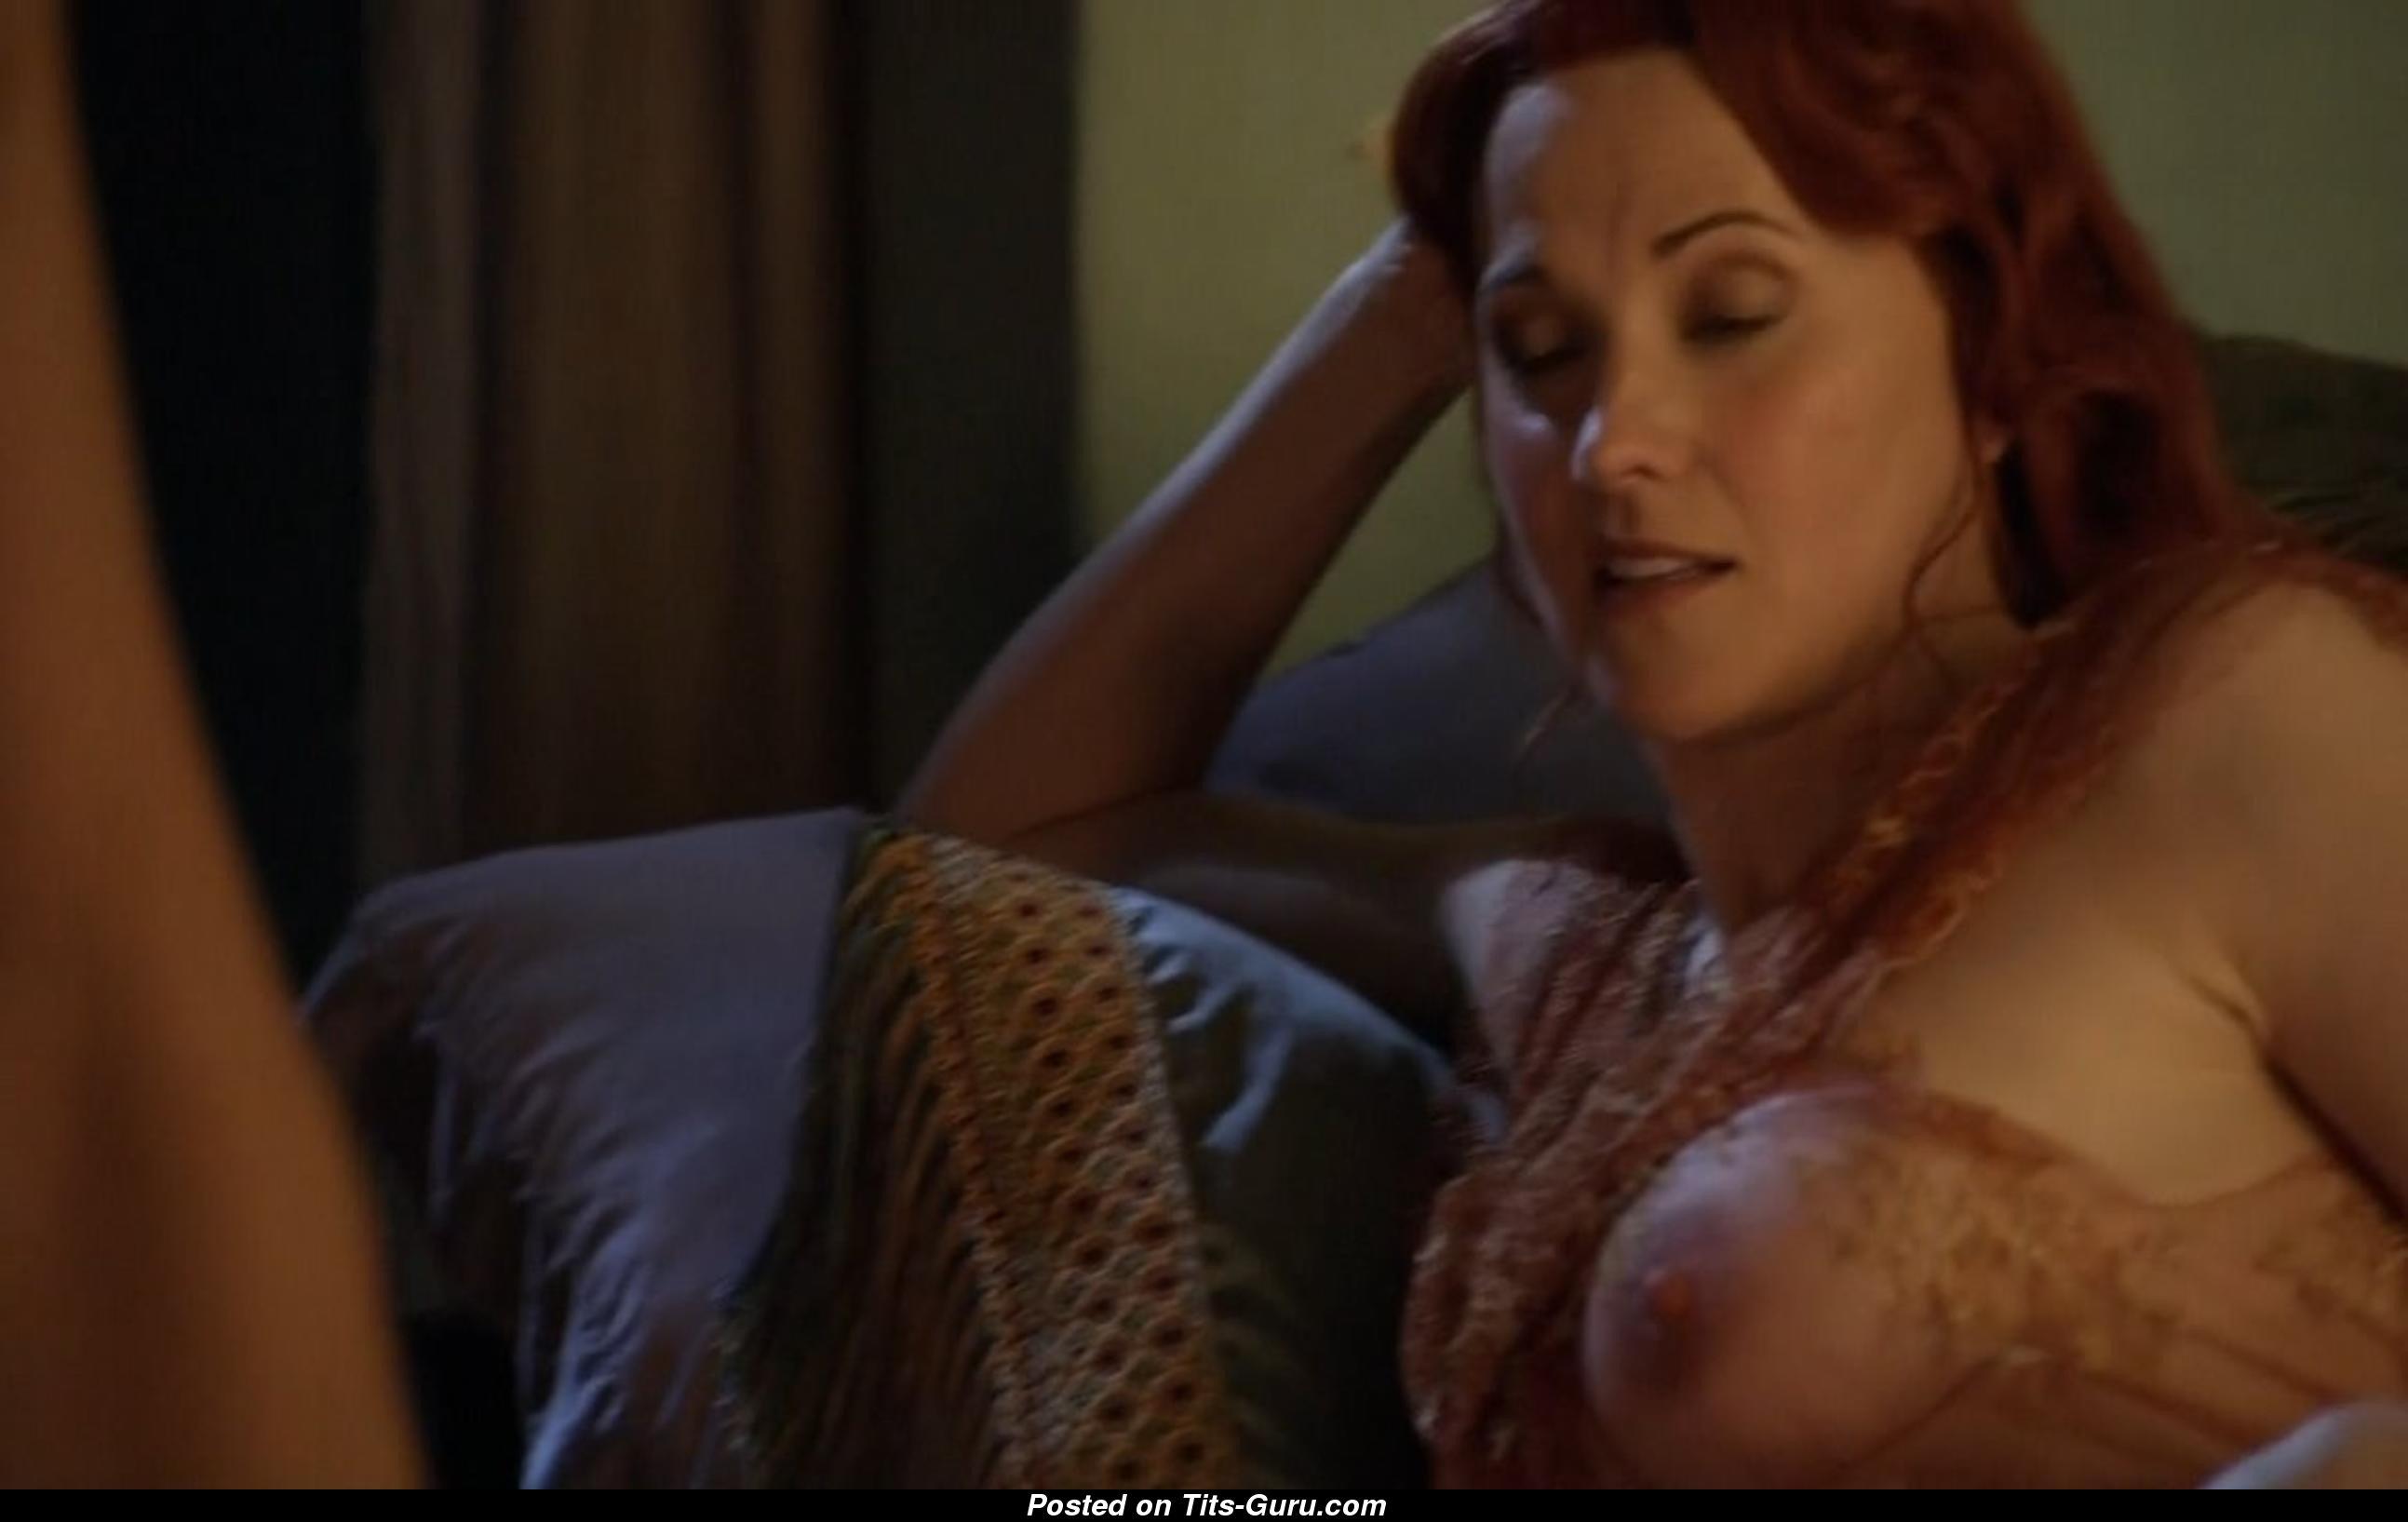 Hannah teter nude pics